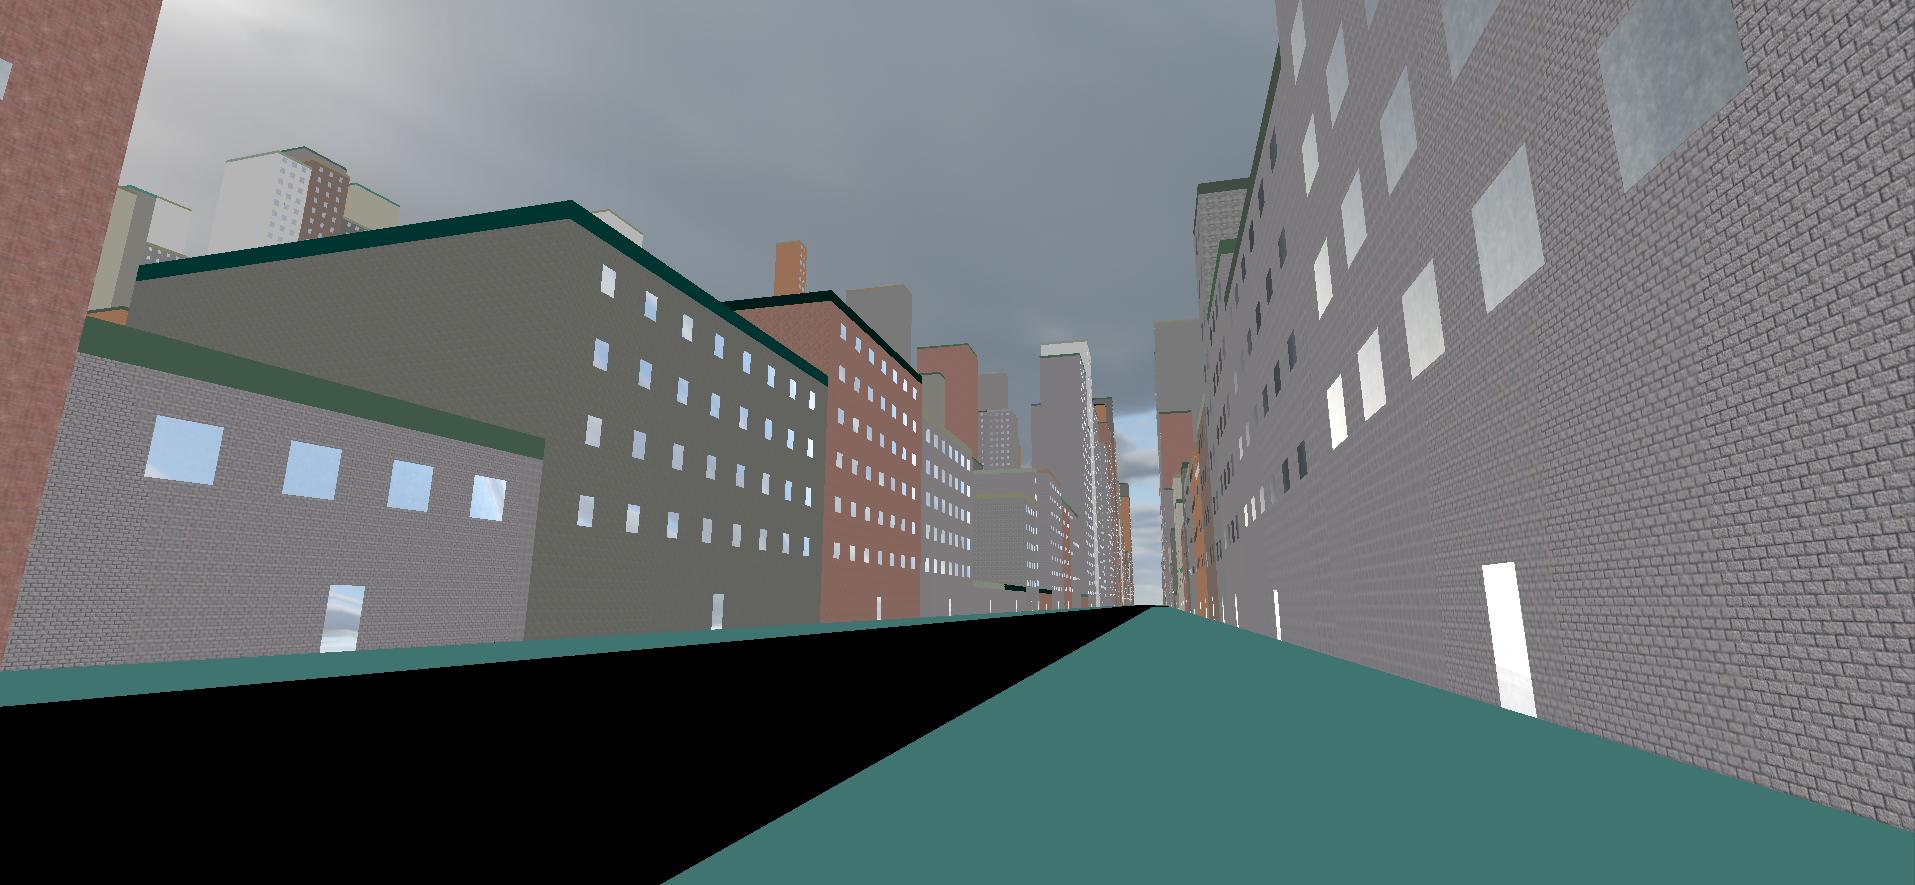 Walking through the procedural city image - The Hit - Mod DB